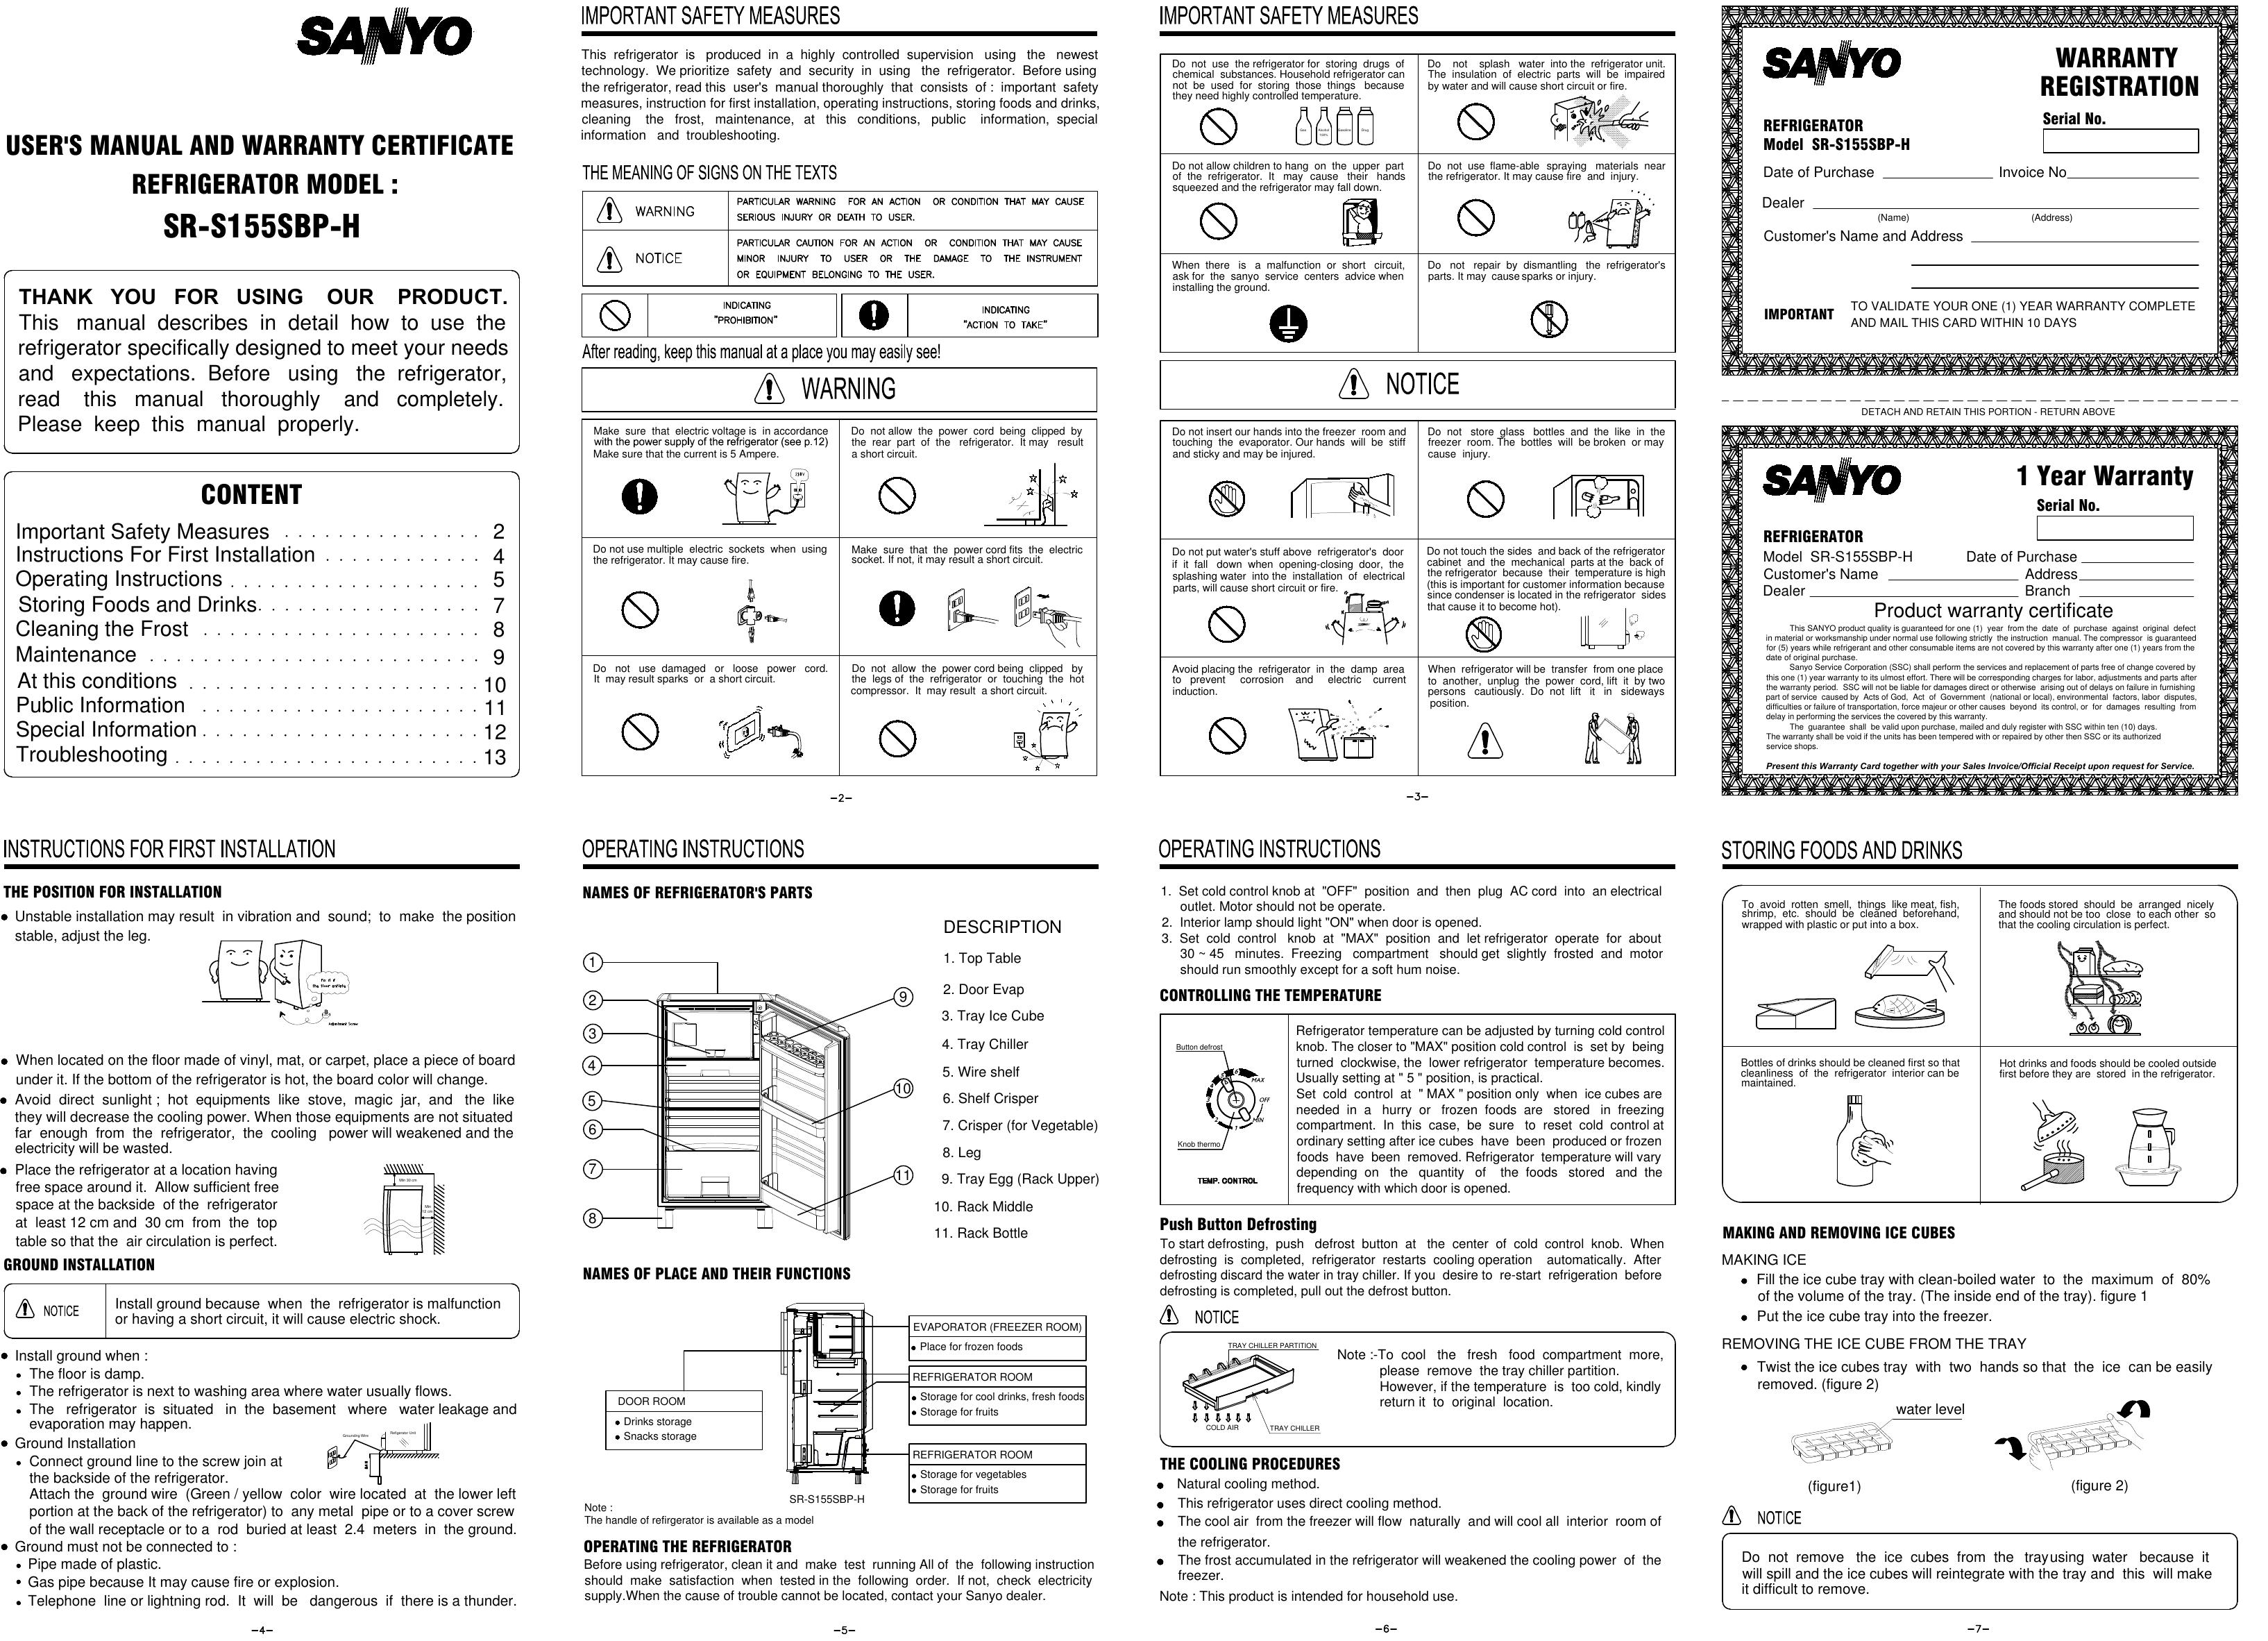 Sanyo Refrigerator Sr S155Sbp H Users Manual